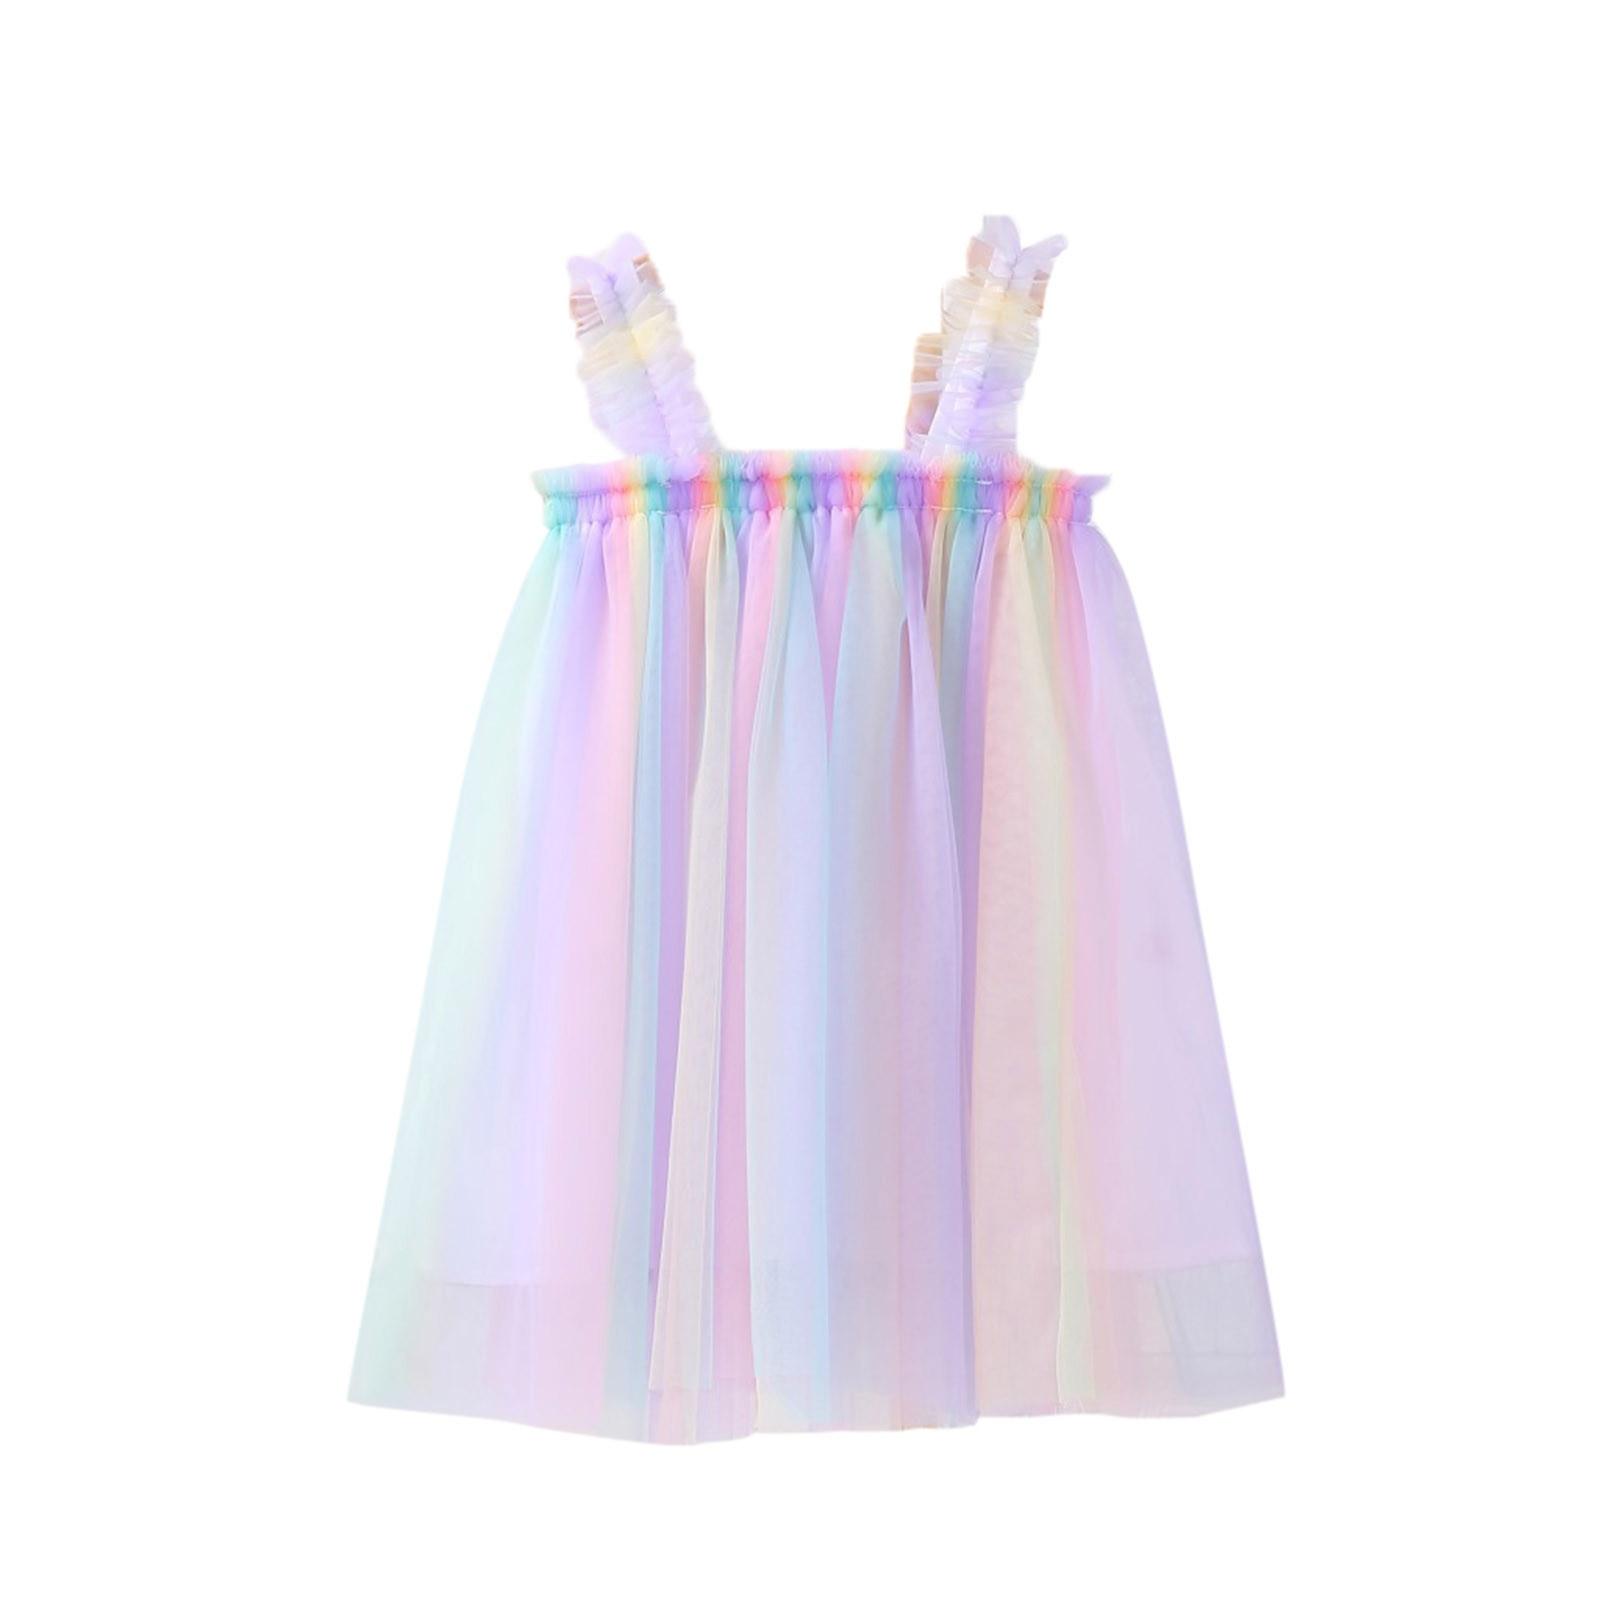 Toddler Baby Kids Girls Strap Sleeveless Tulle Dress Princess Dresses Clothes платье для девочки Summer Baby Girl Dress 2021